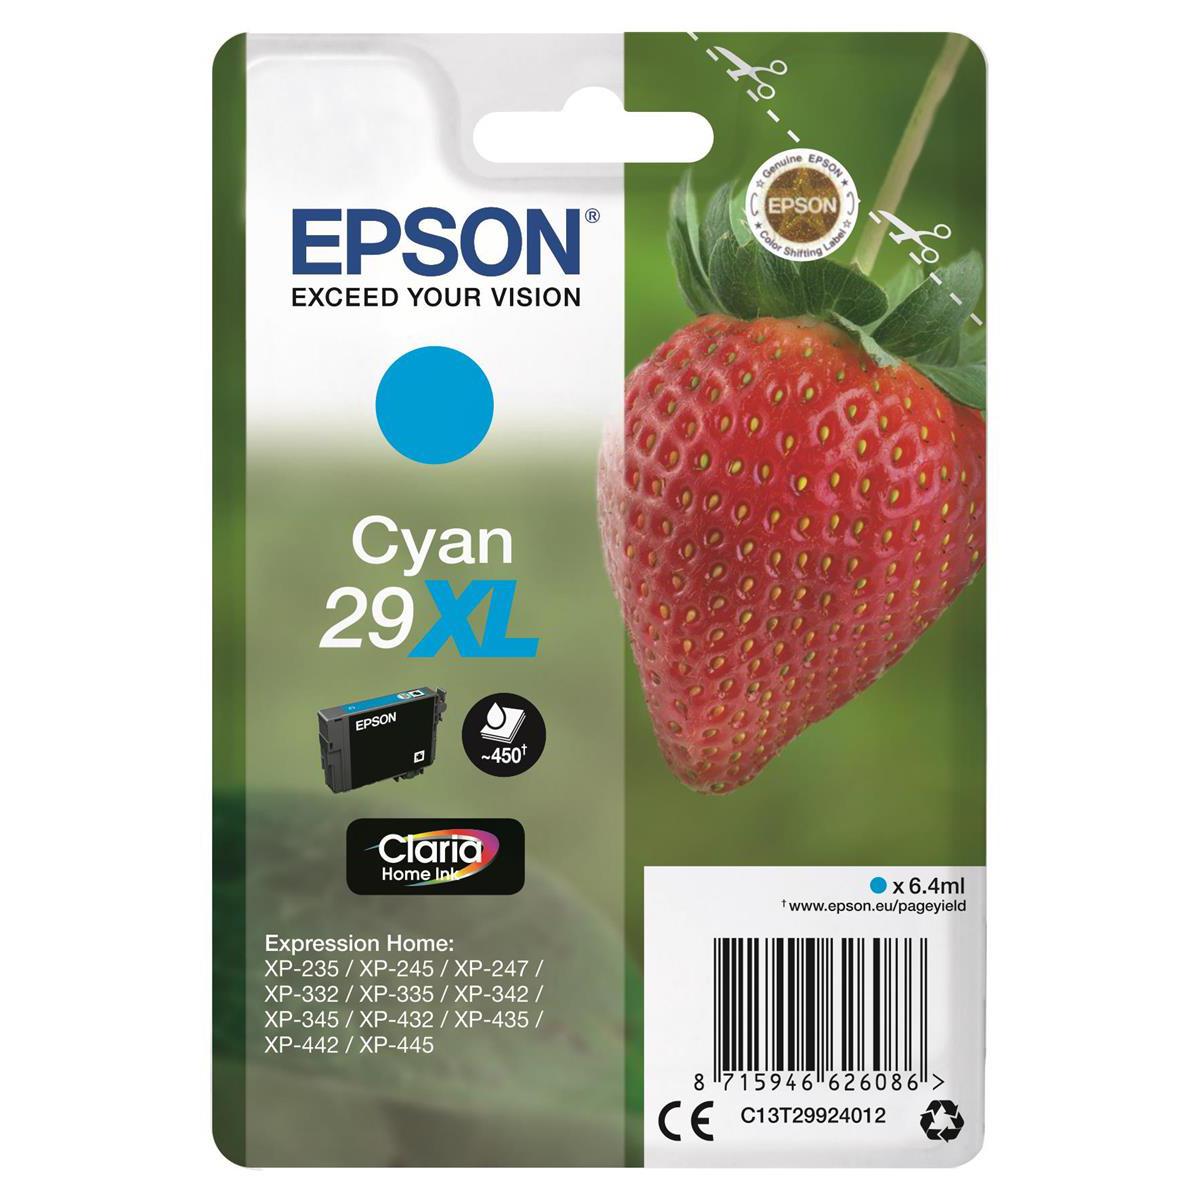 Epson 29XL InkJet Cartridge Strawberry High Yield Page Life 450pp 6.4ml Cyan Ref C13T29924012